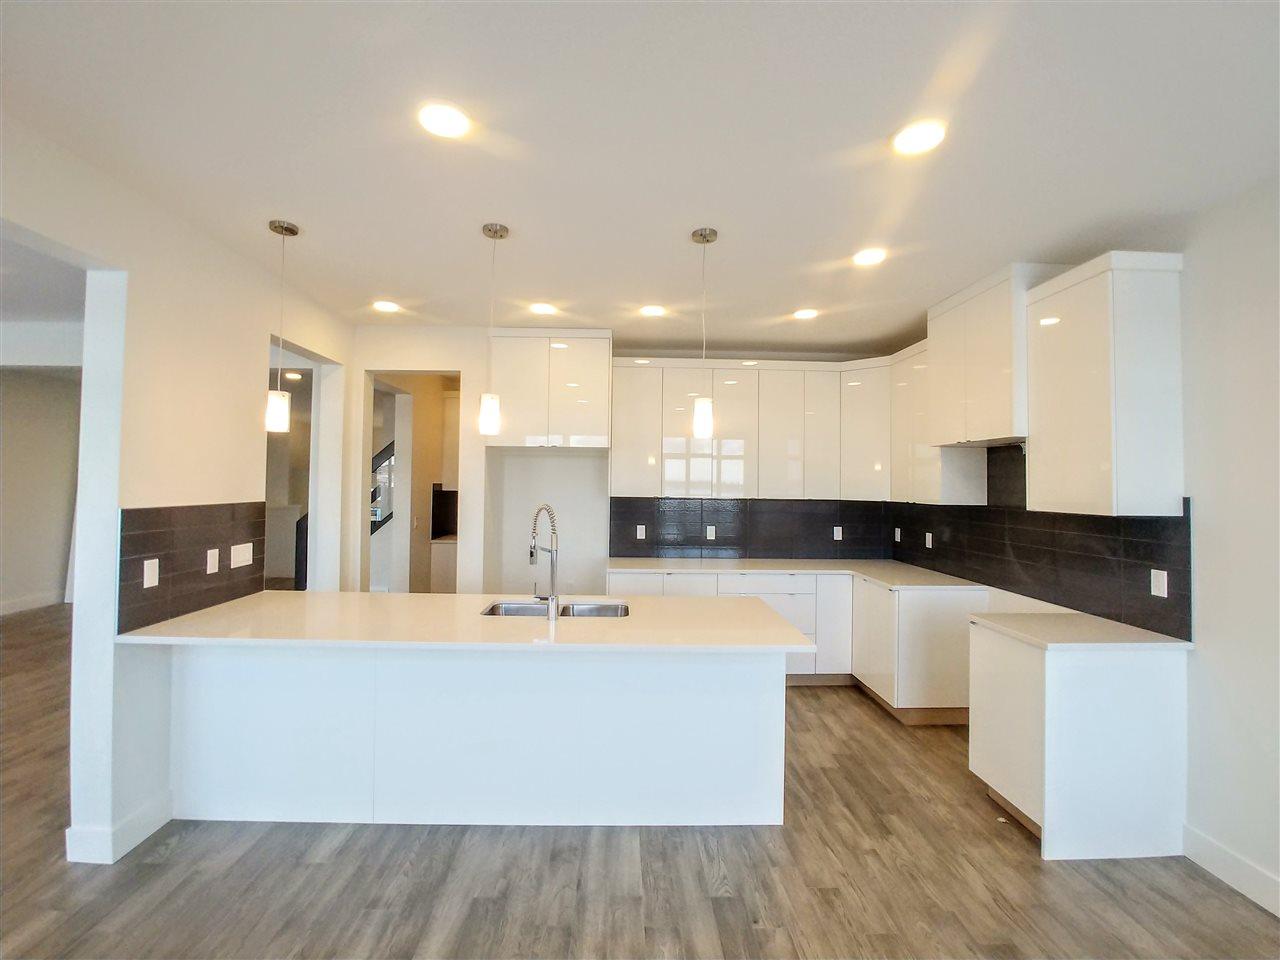 Sold: 6228 King Vista, Edmonton, AB